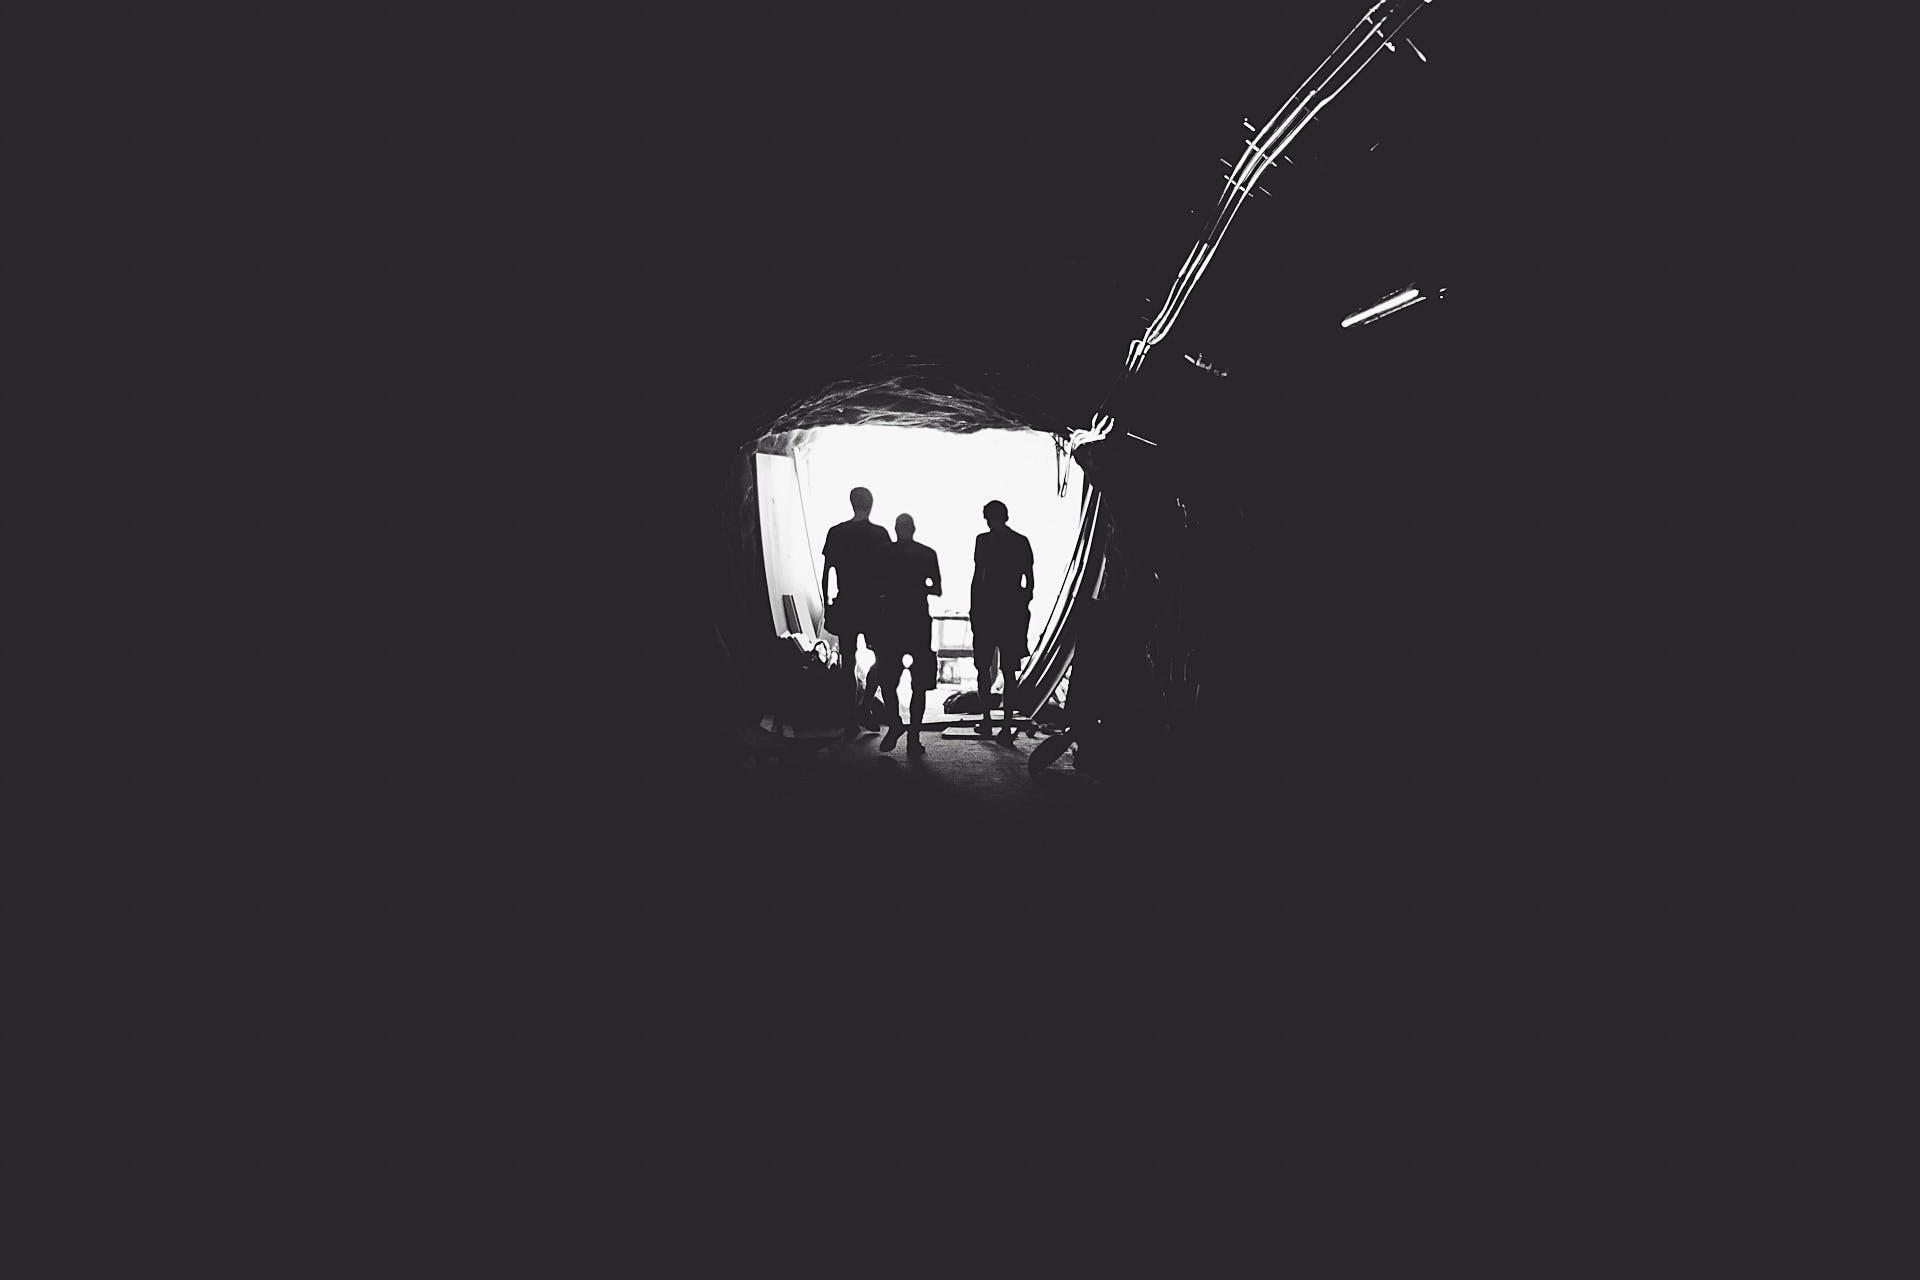 Free stock photo of black-and-white, people, dark, men